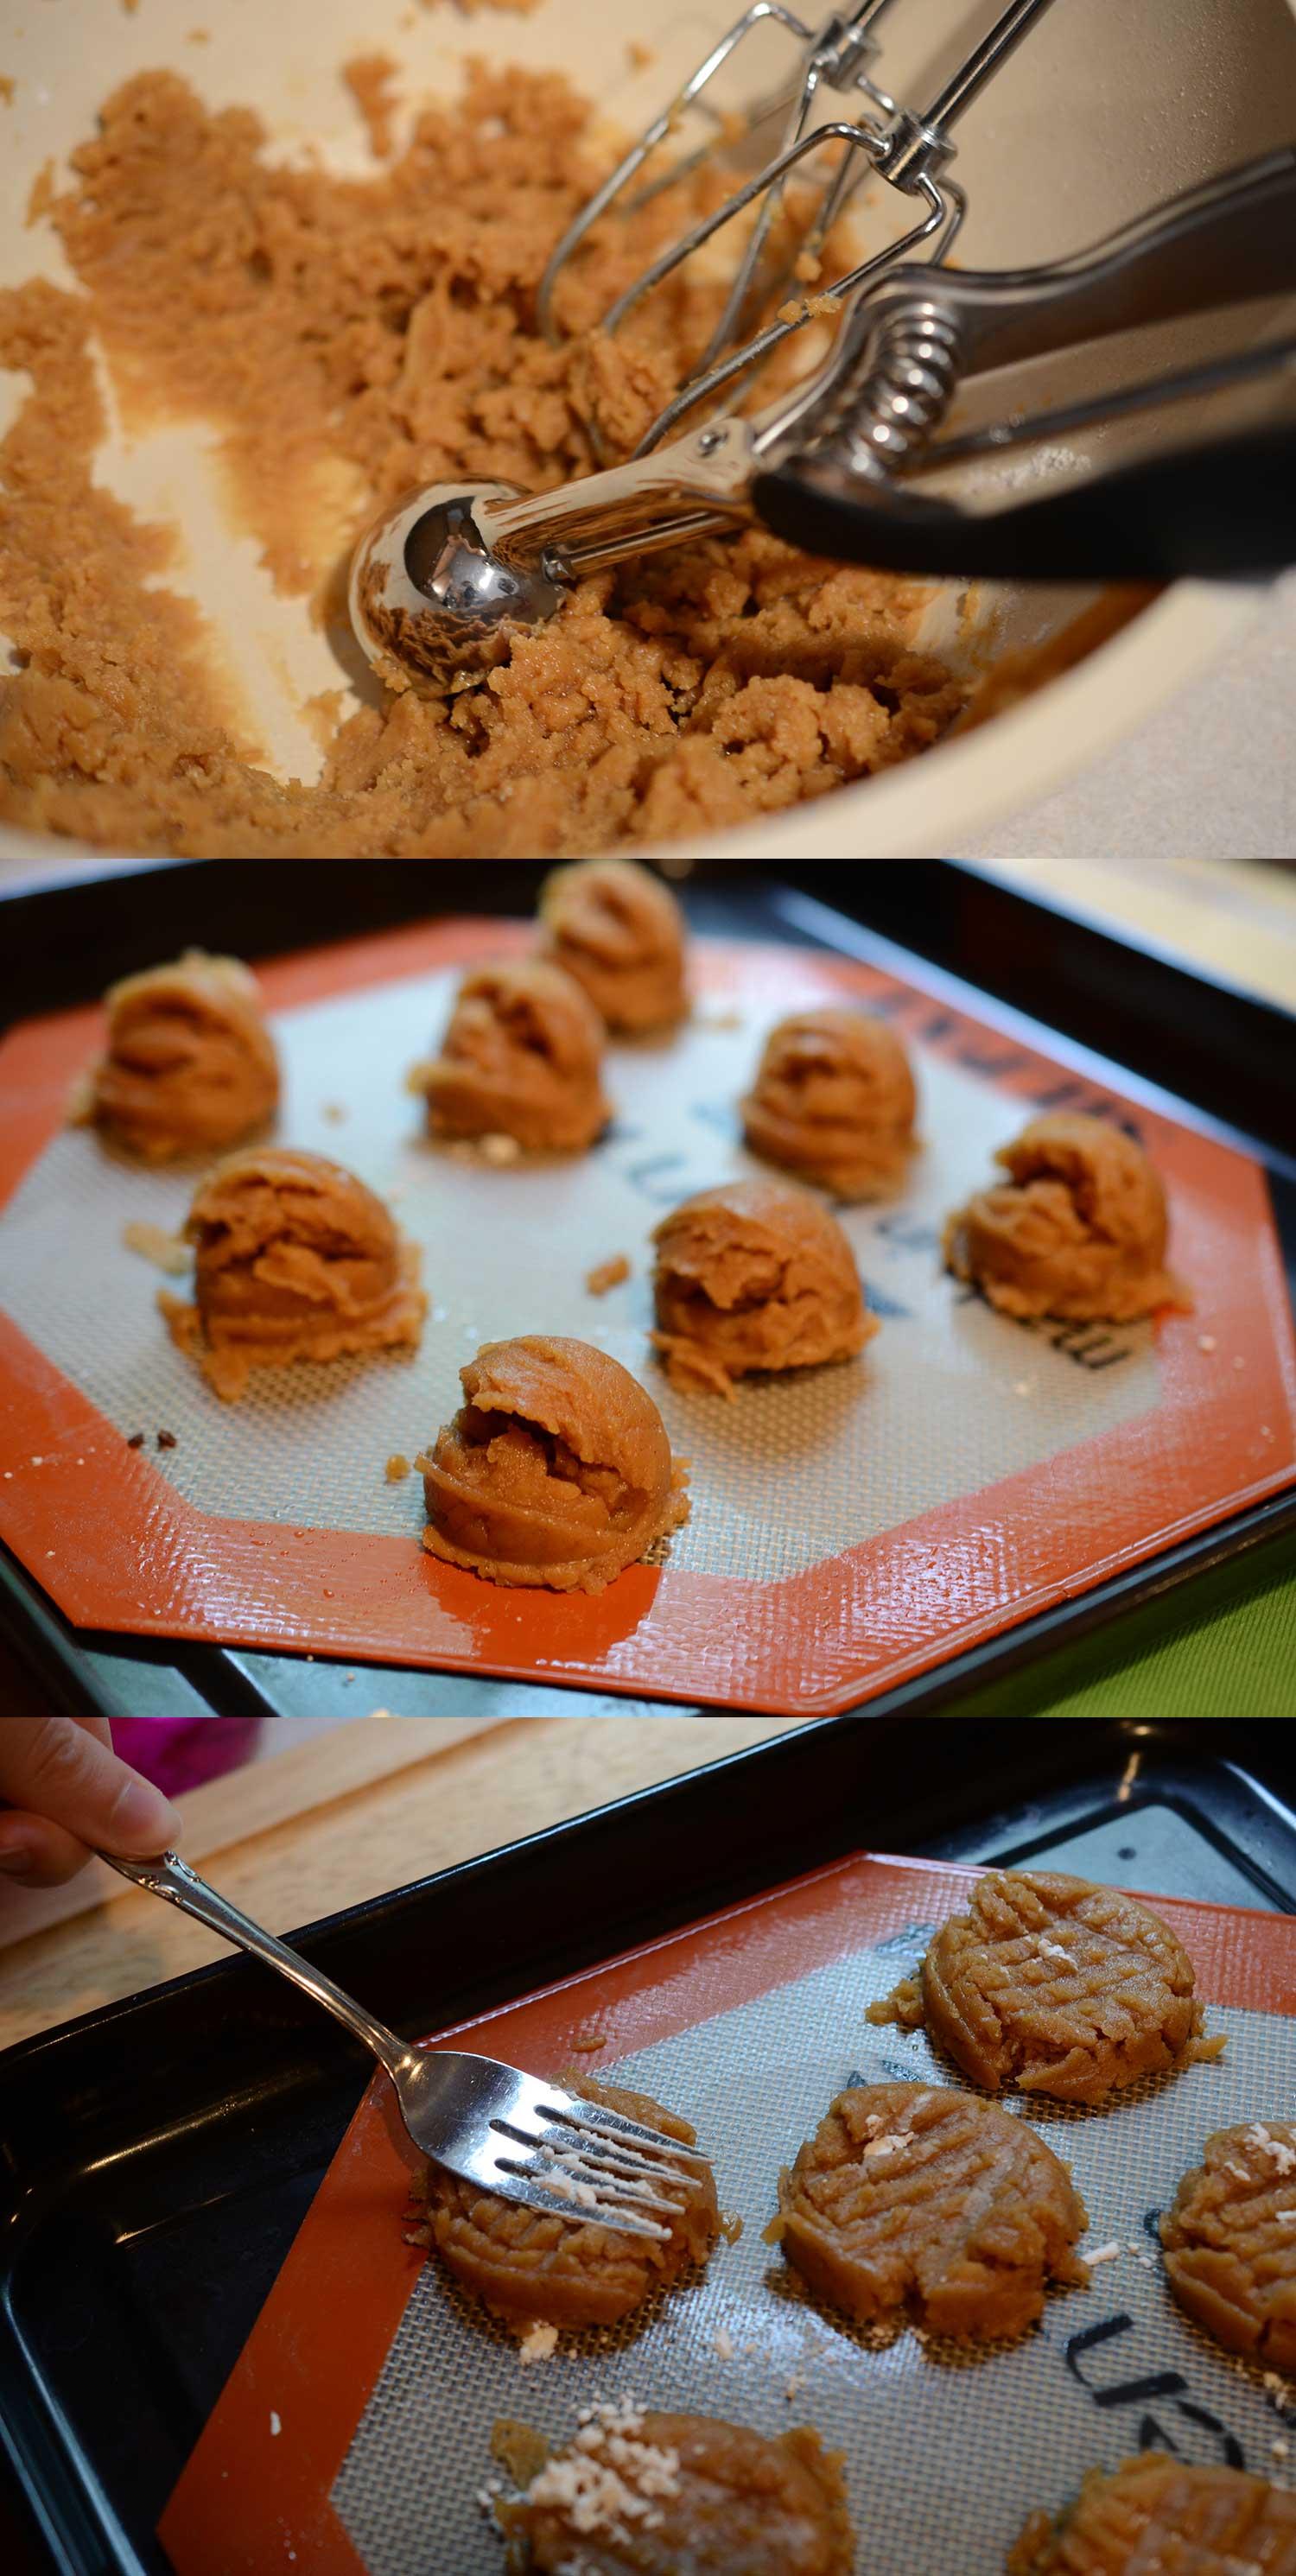 peanut-butter-cookies-gluten-free.jpg